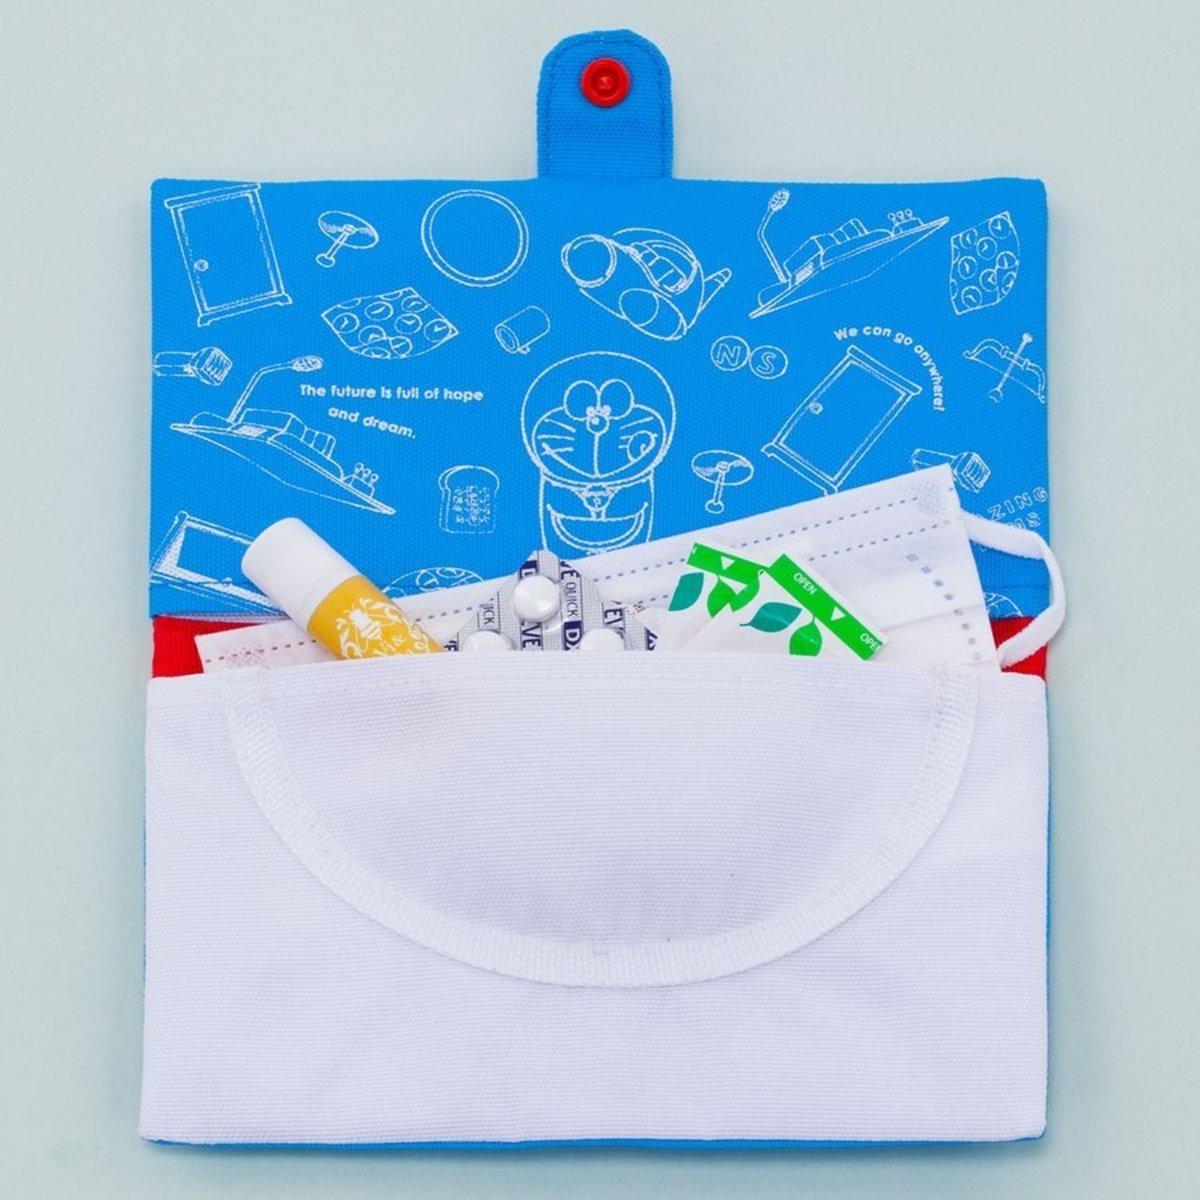 (Doraemon Treasure Bag) Japan Portable Surgical Mask Storage Bag/Anti-epidemic Supplies Treasure Bag